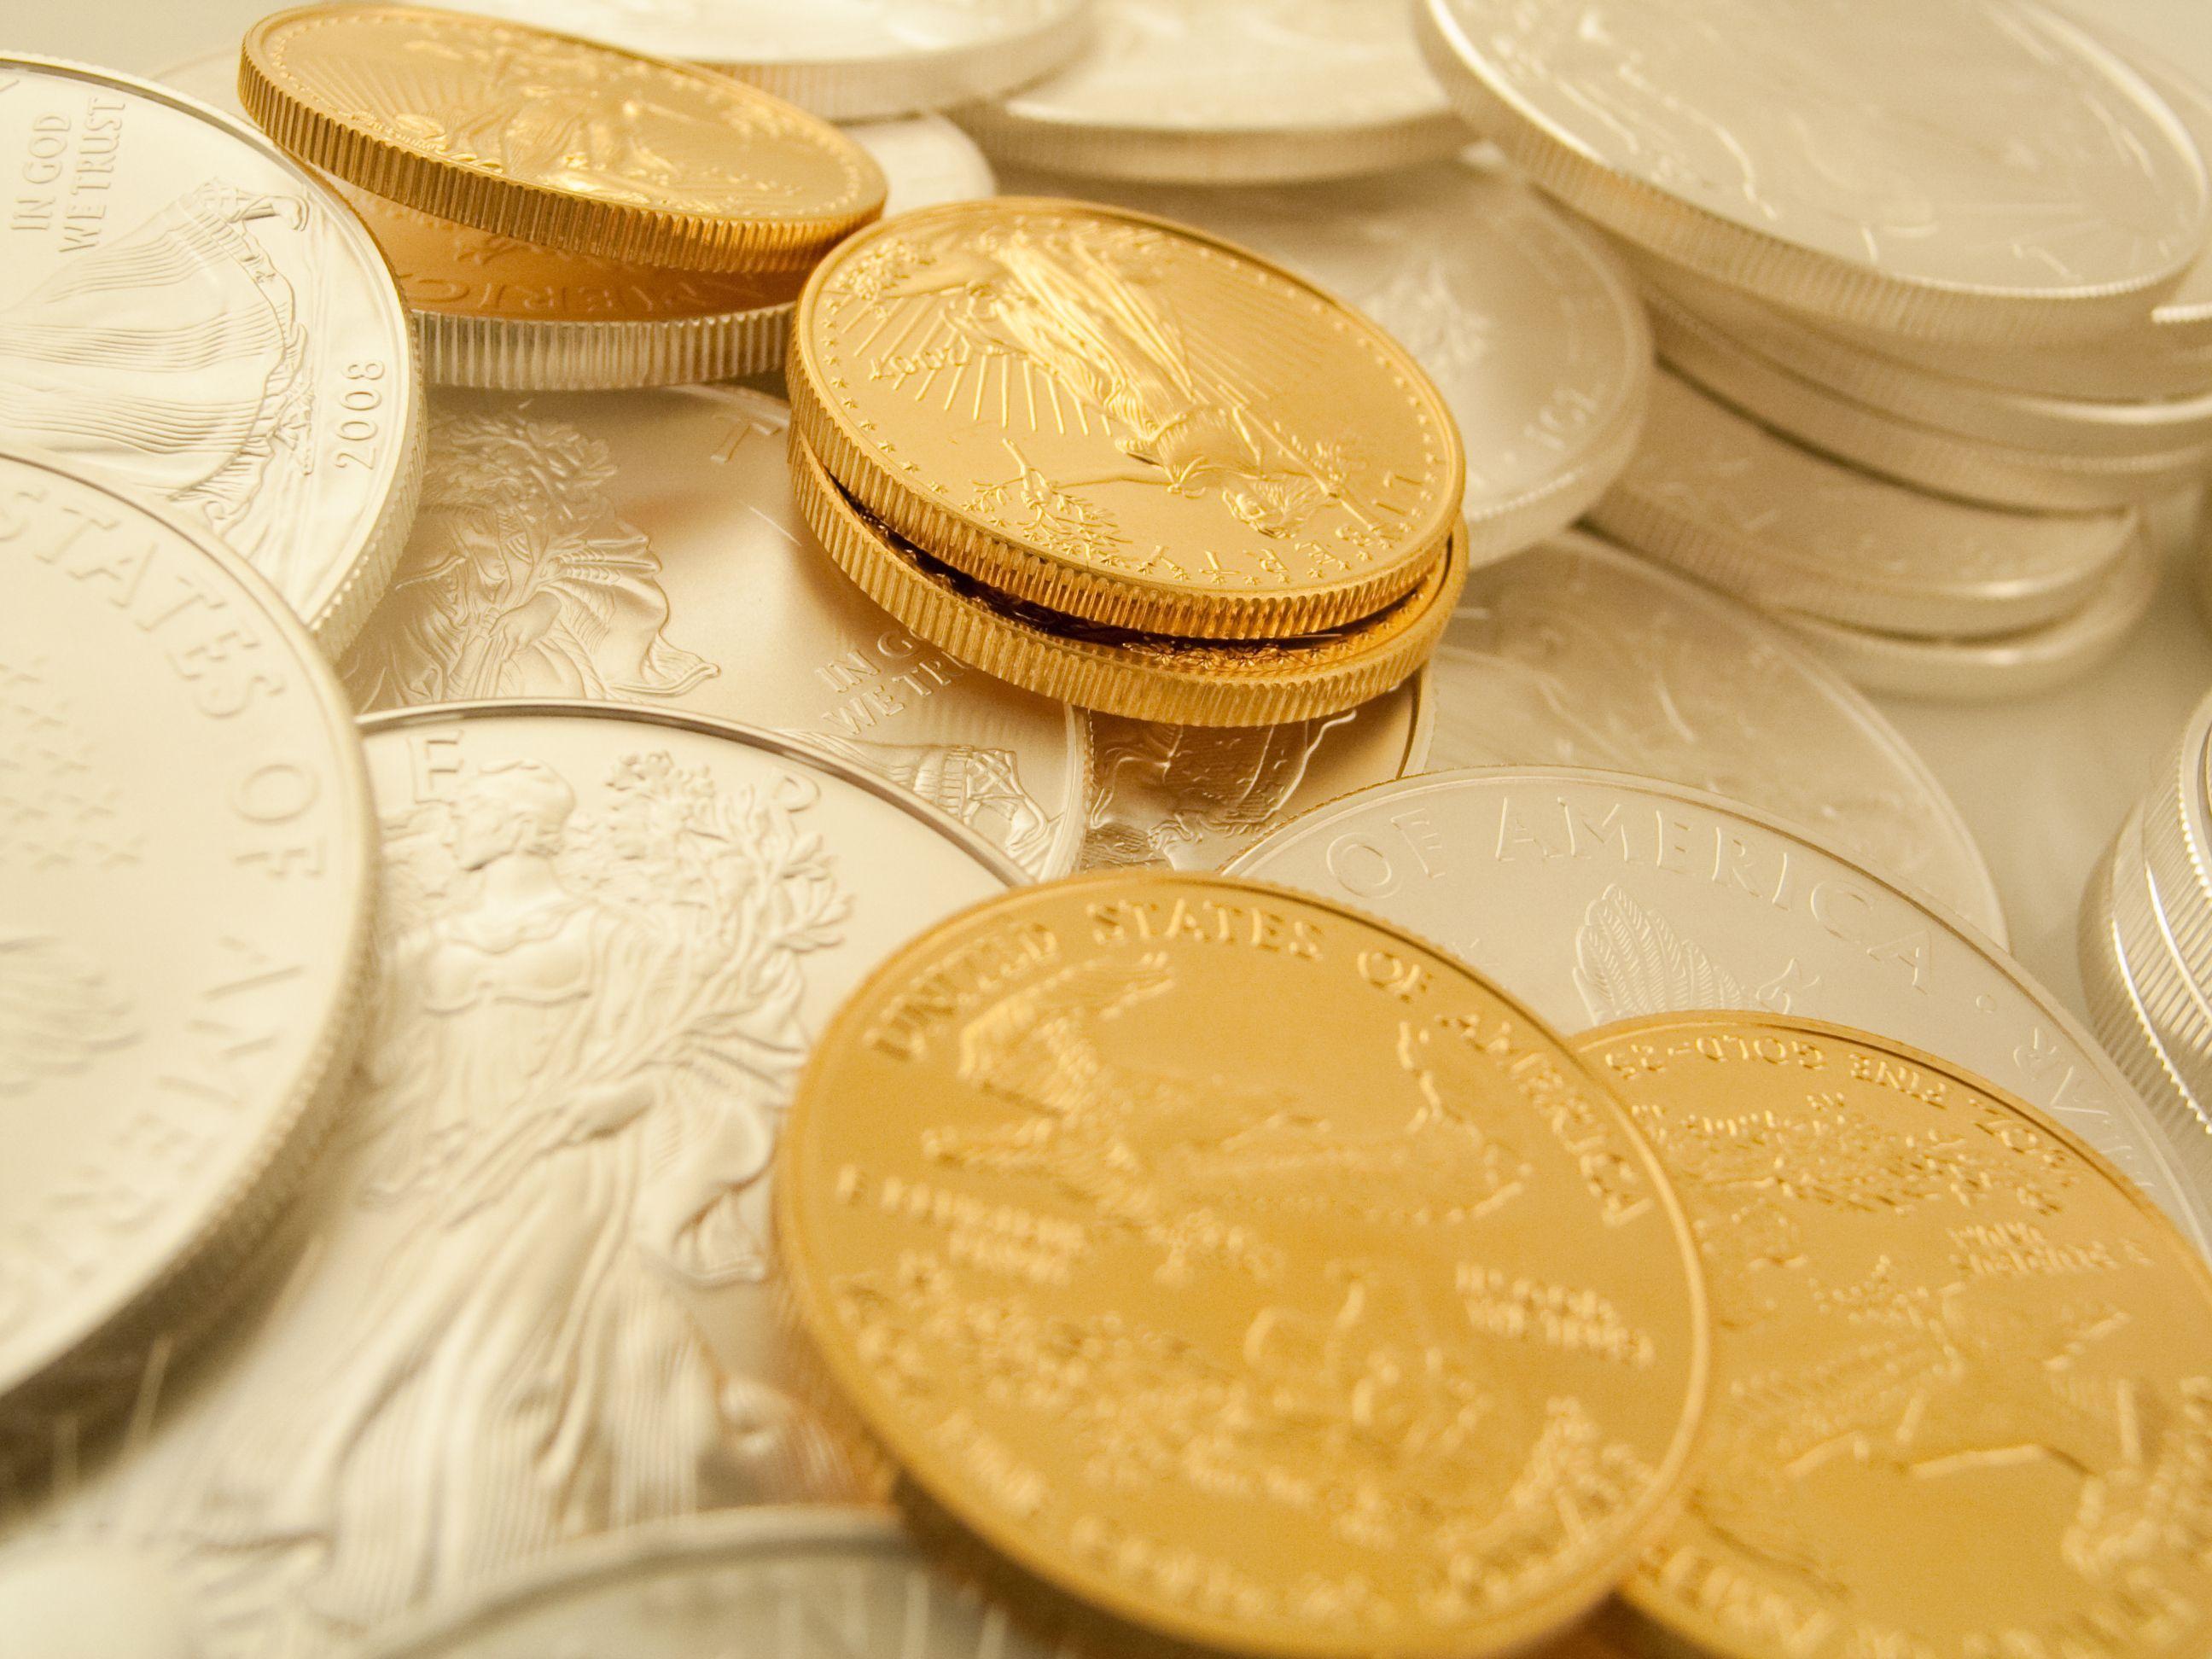 American Eagles Gold And Silver Bullion 1 Oz Coins Gold And Silver Coins Gold Price Chart Coin Prices